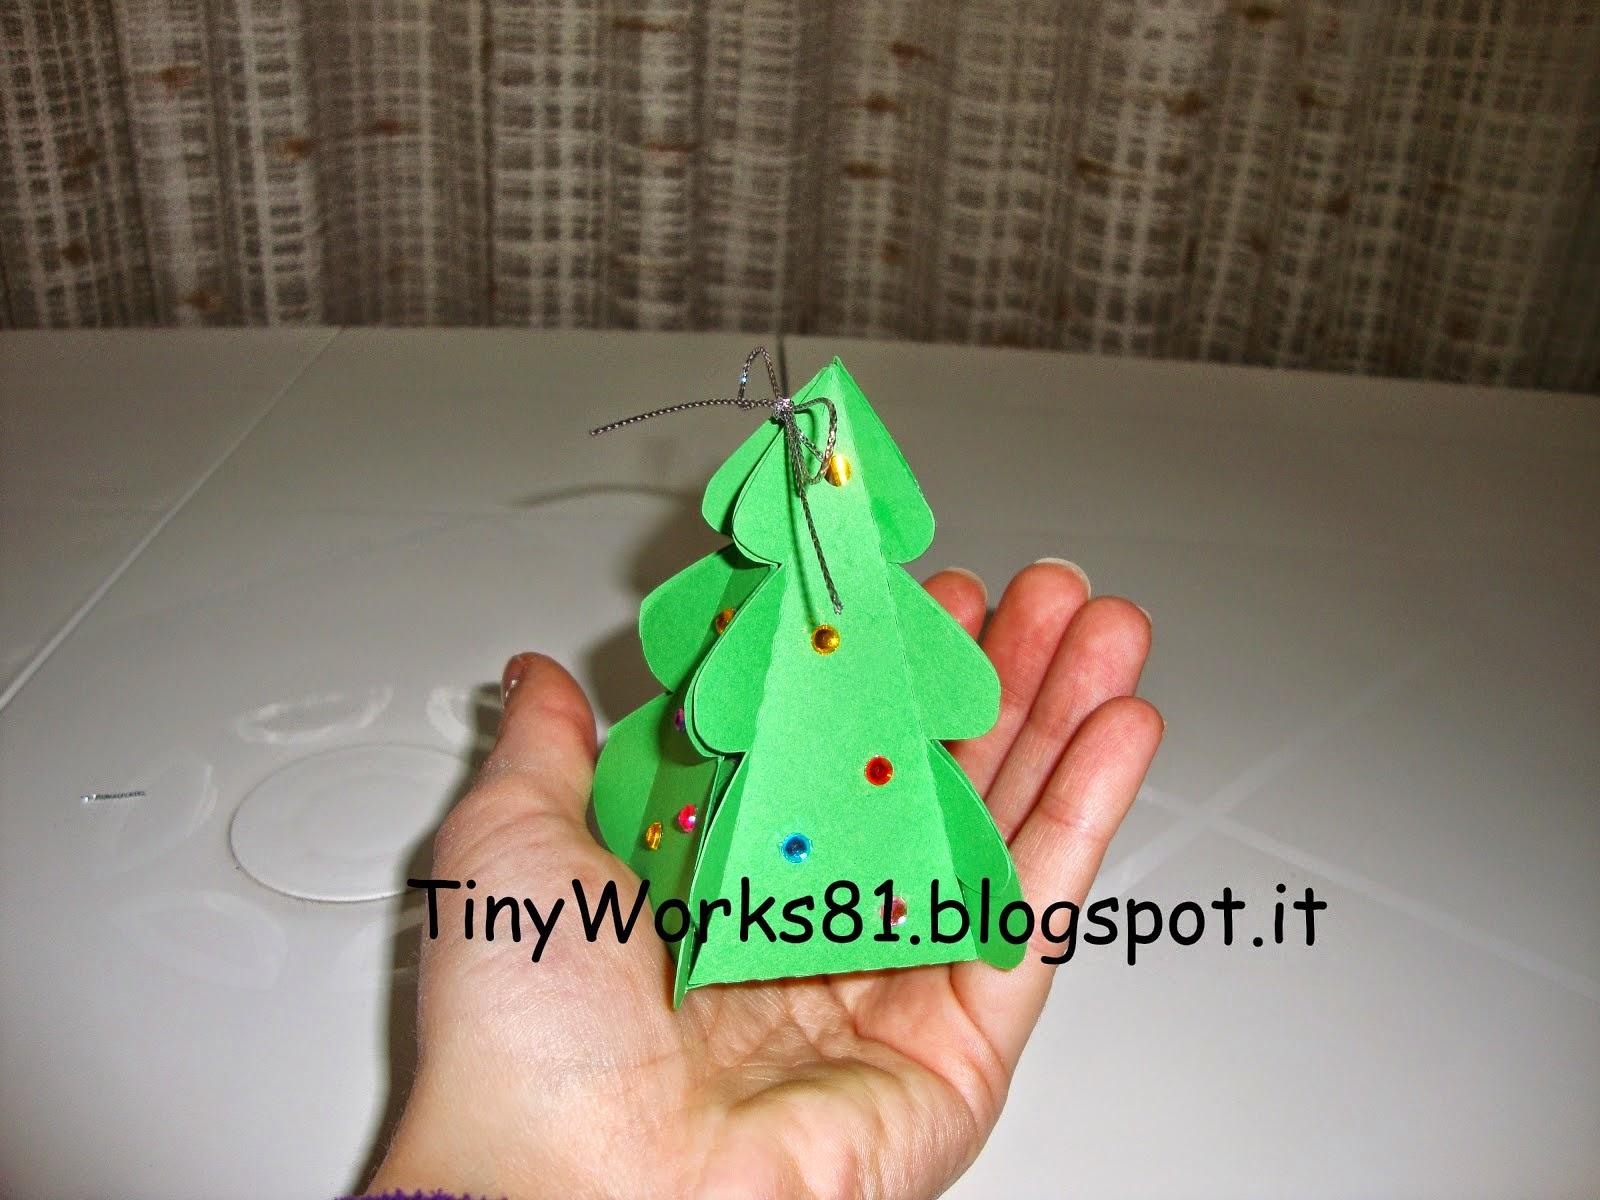 http://tinyworks81.blogspot.it/2014/12/box-albero-di-natale.html